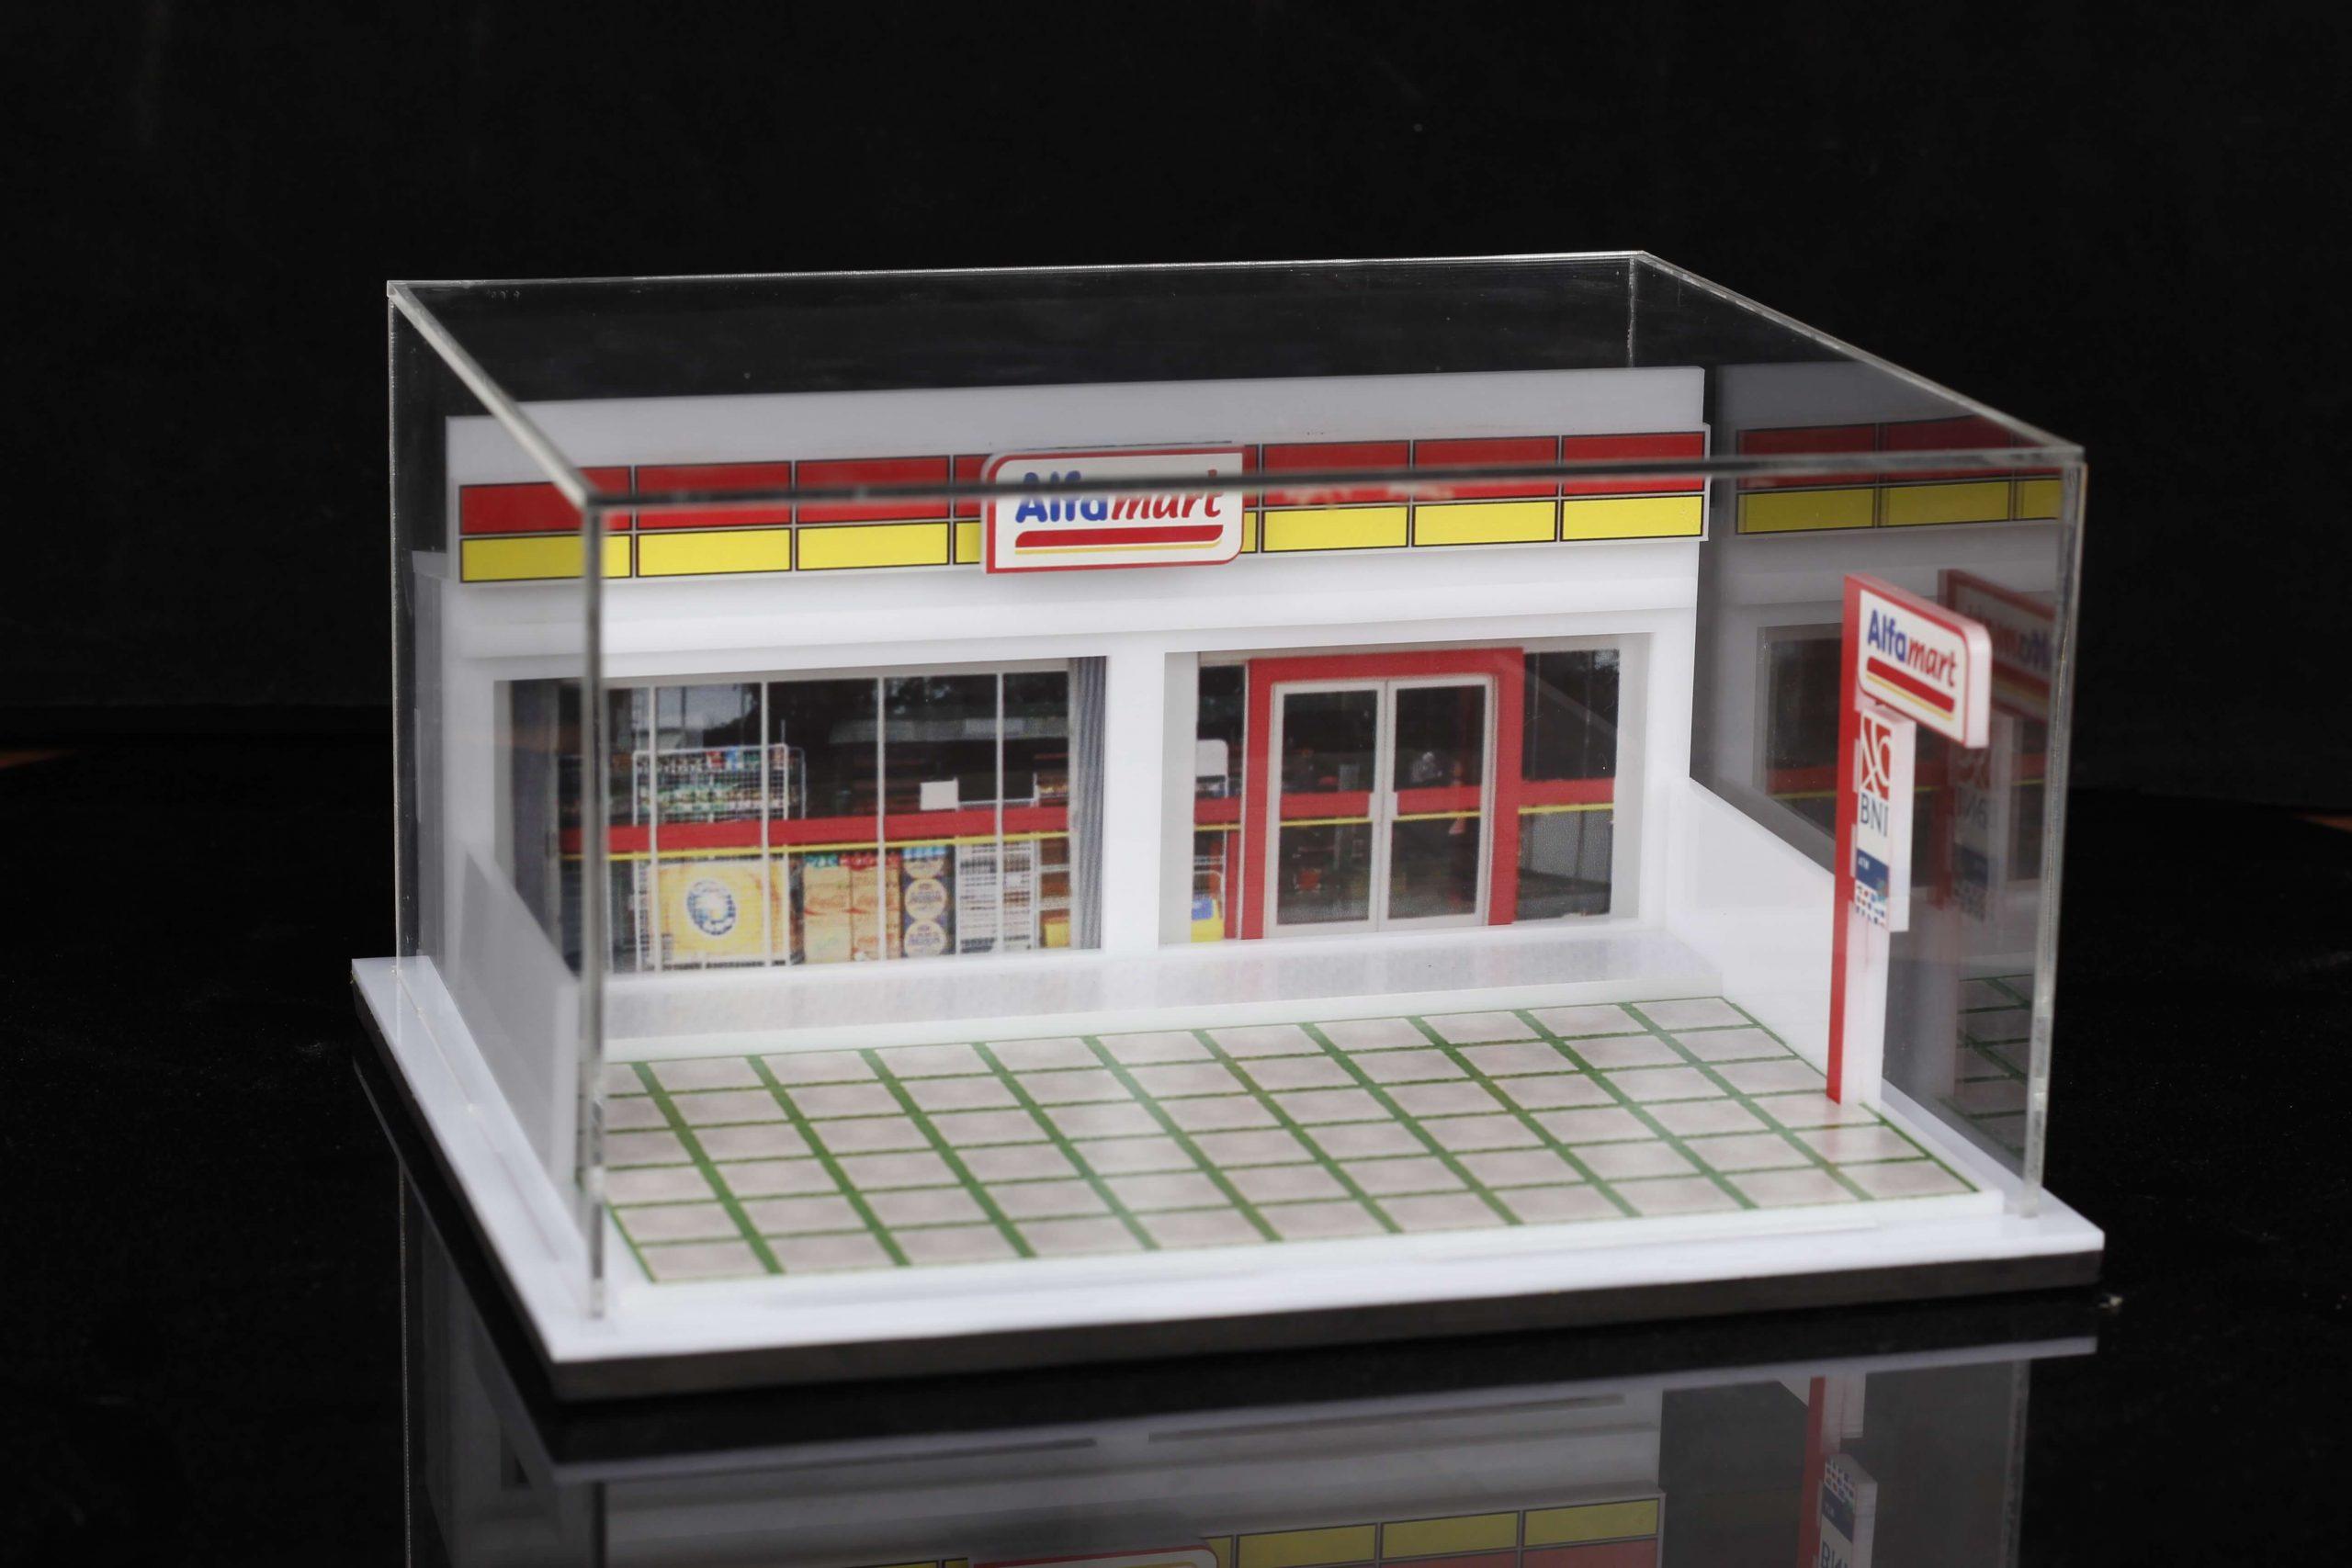 Proses Pembuatan Diorama / Miniatur dari Akrilik Keren Banget!!